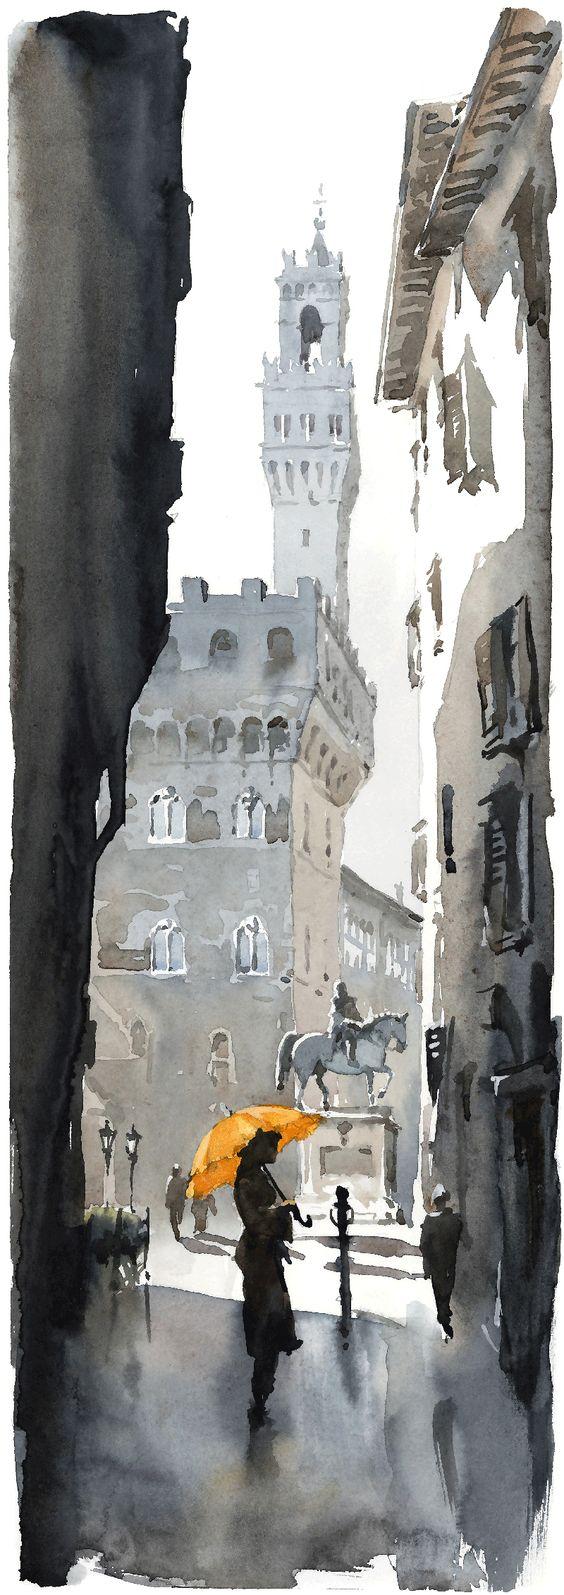 L' Italie ... - Page 11 F568ed10